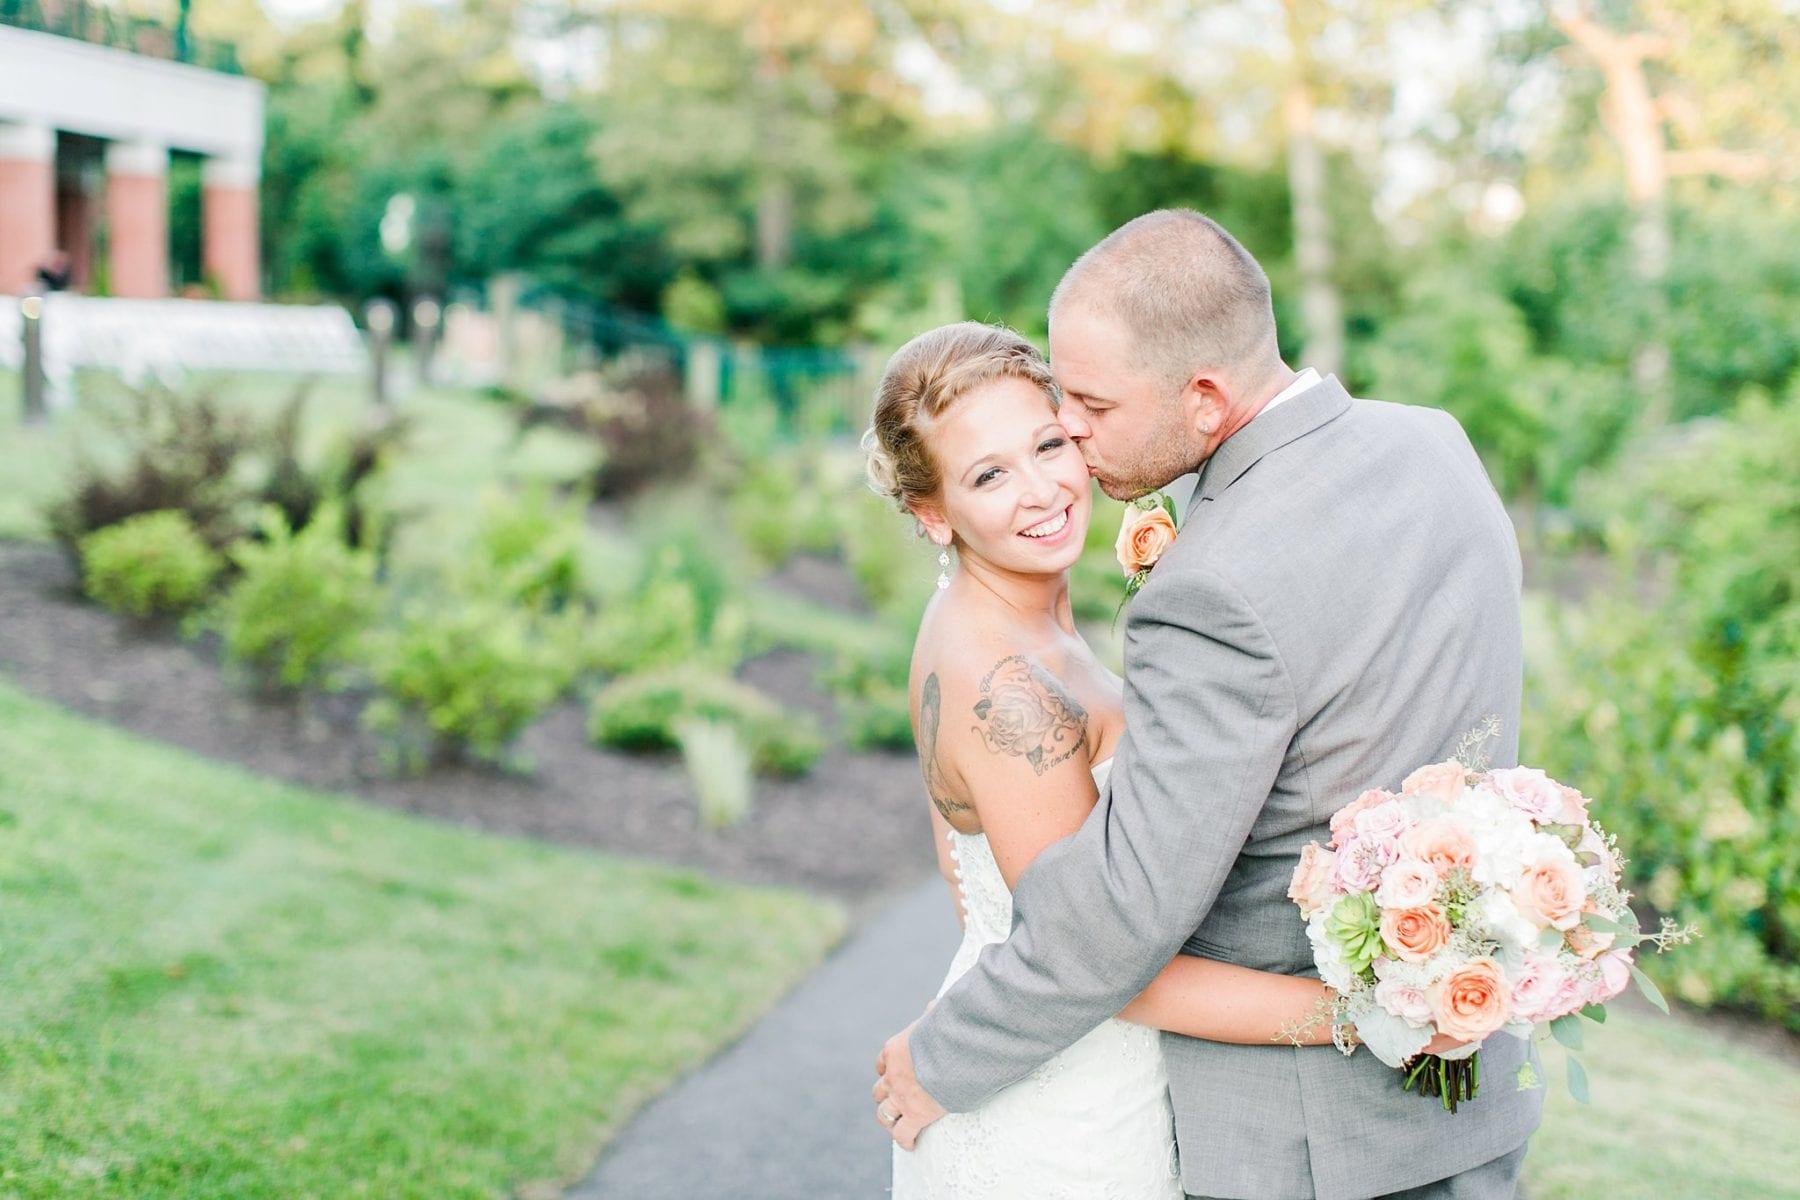 Waters Edge Wedding Photos Maryland Wedding Photographer Megan Kelsey Photography Katie & Conor-515.JPG